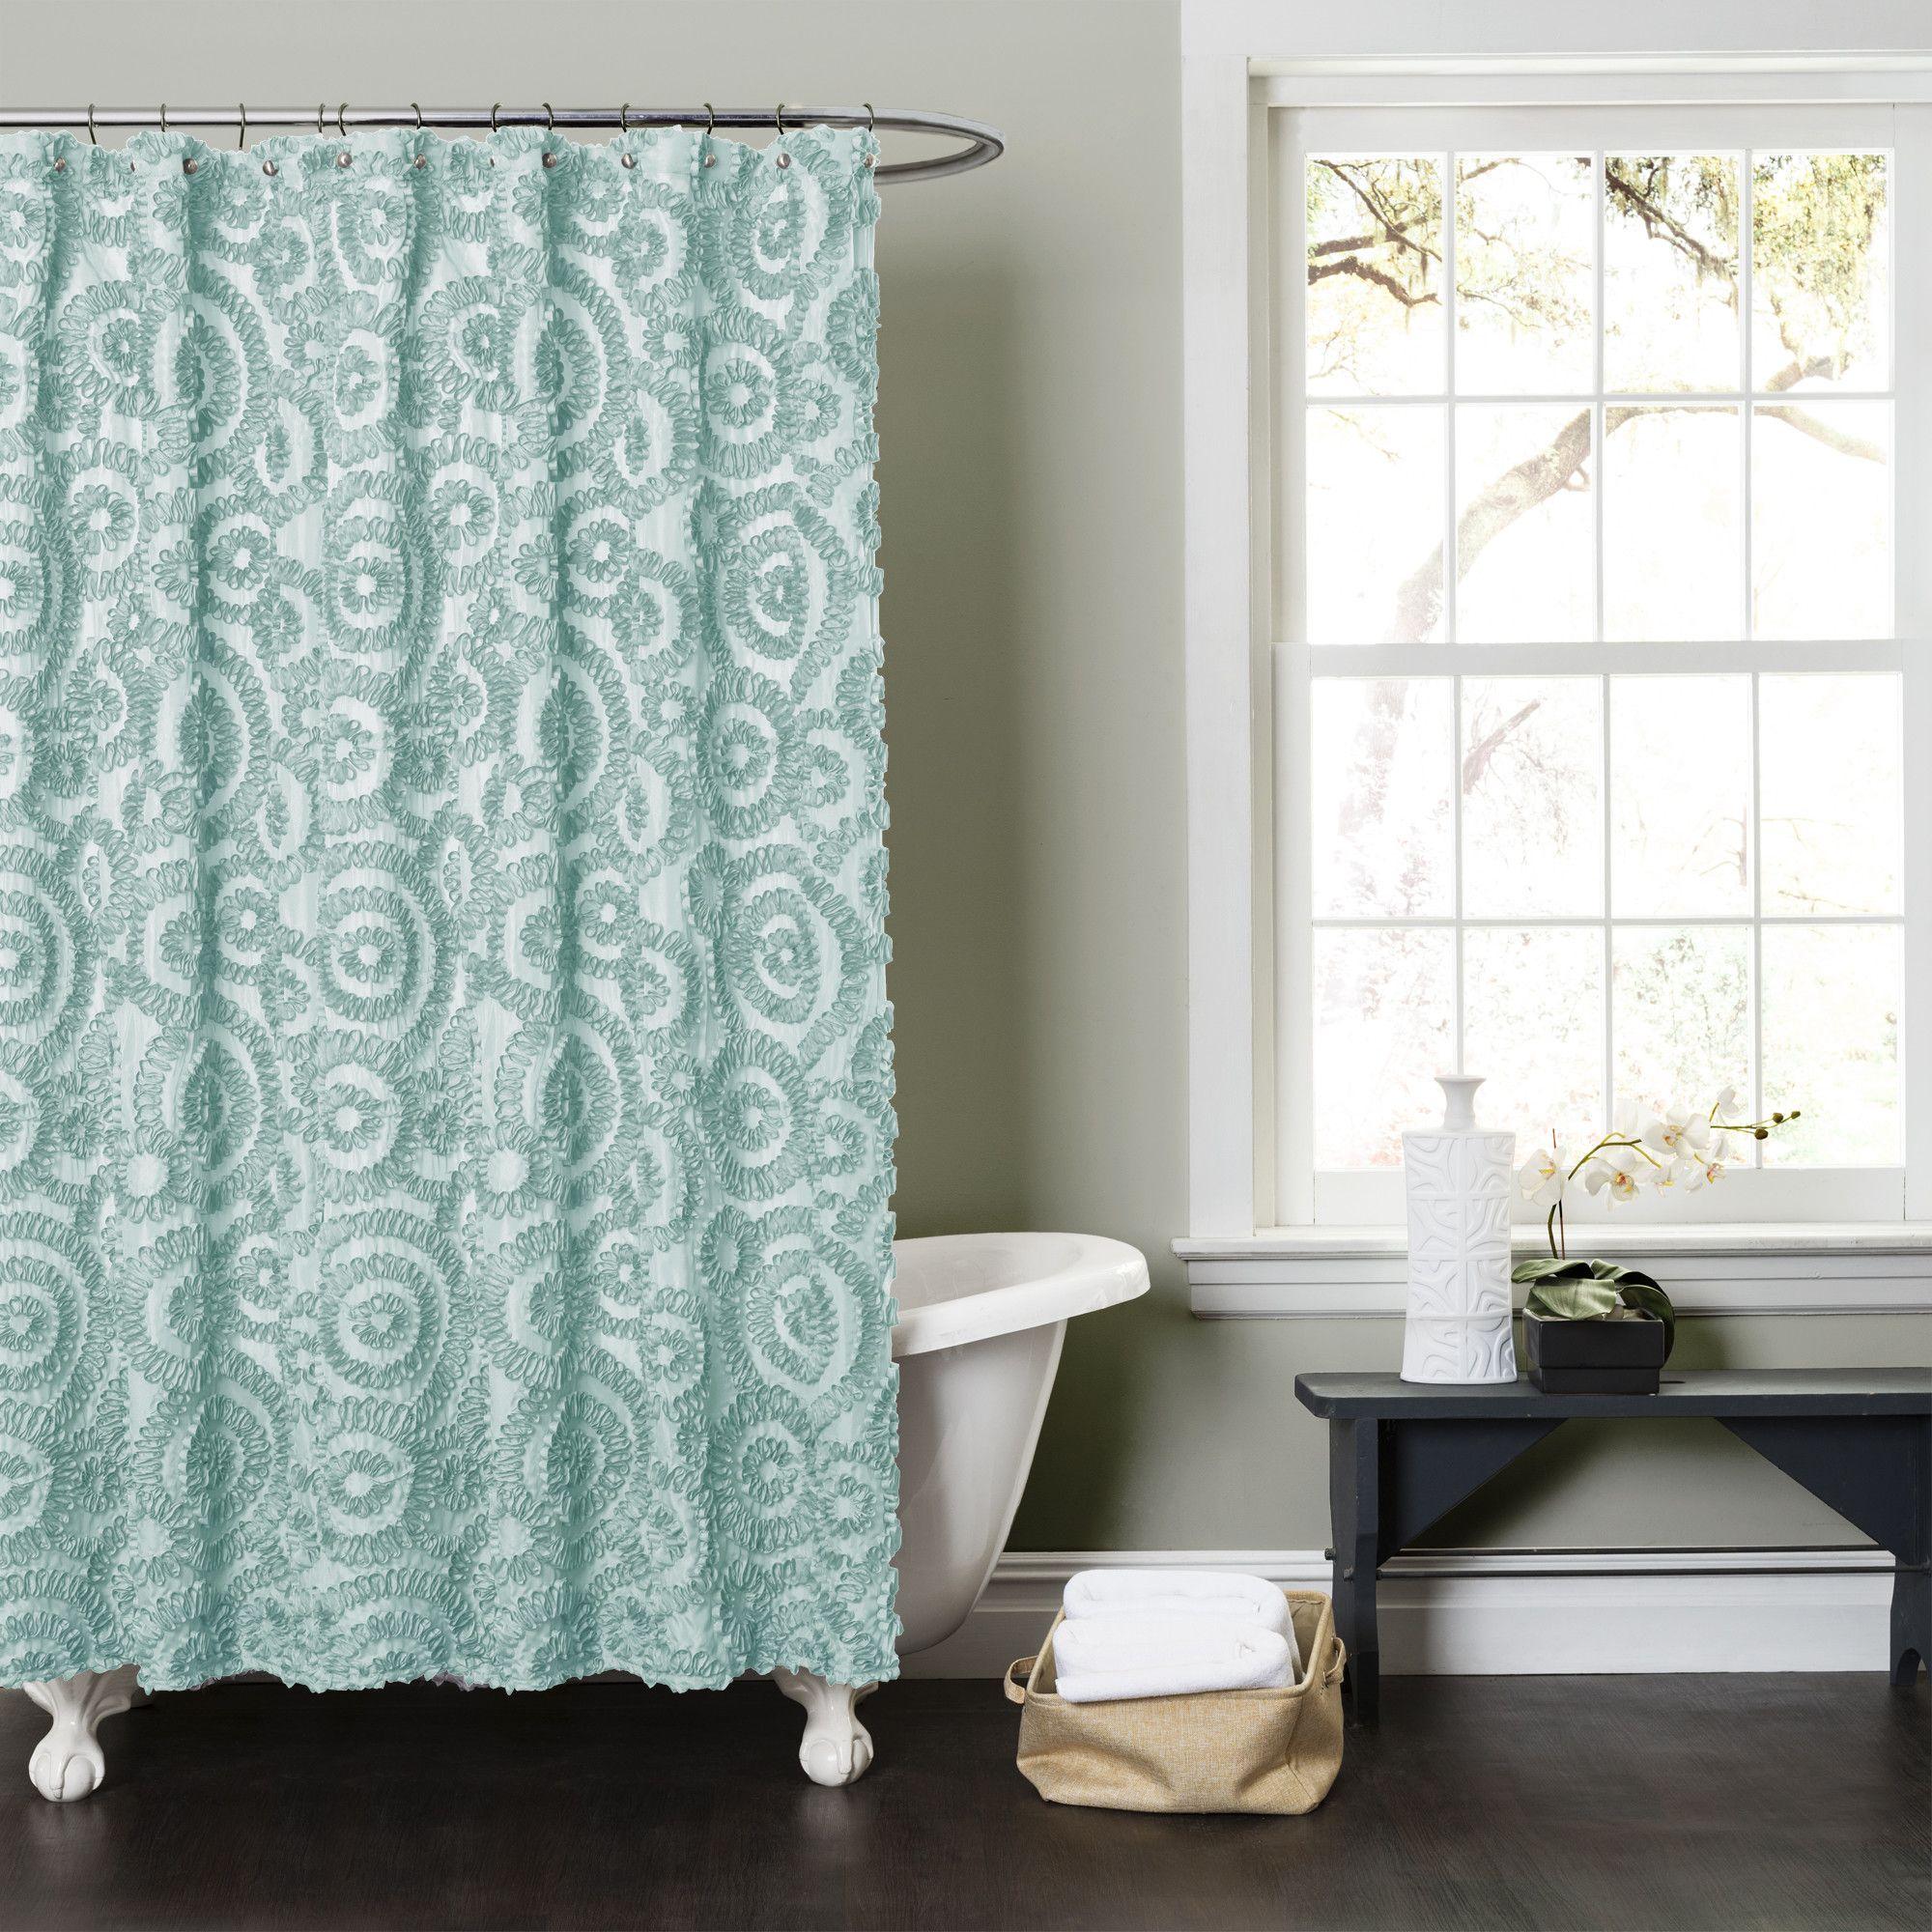 Lush Decor Stella Shower Curtain Reviews Wayfair Fabric